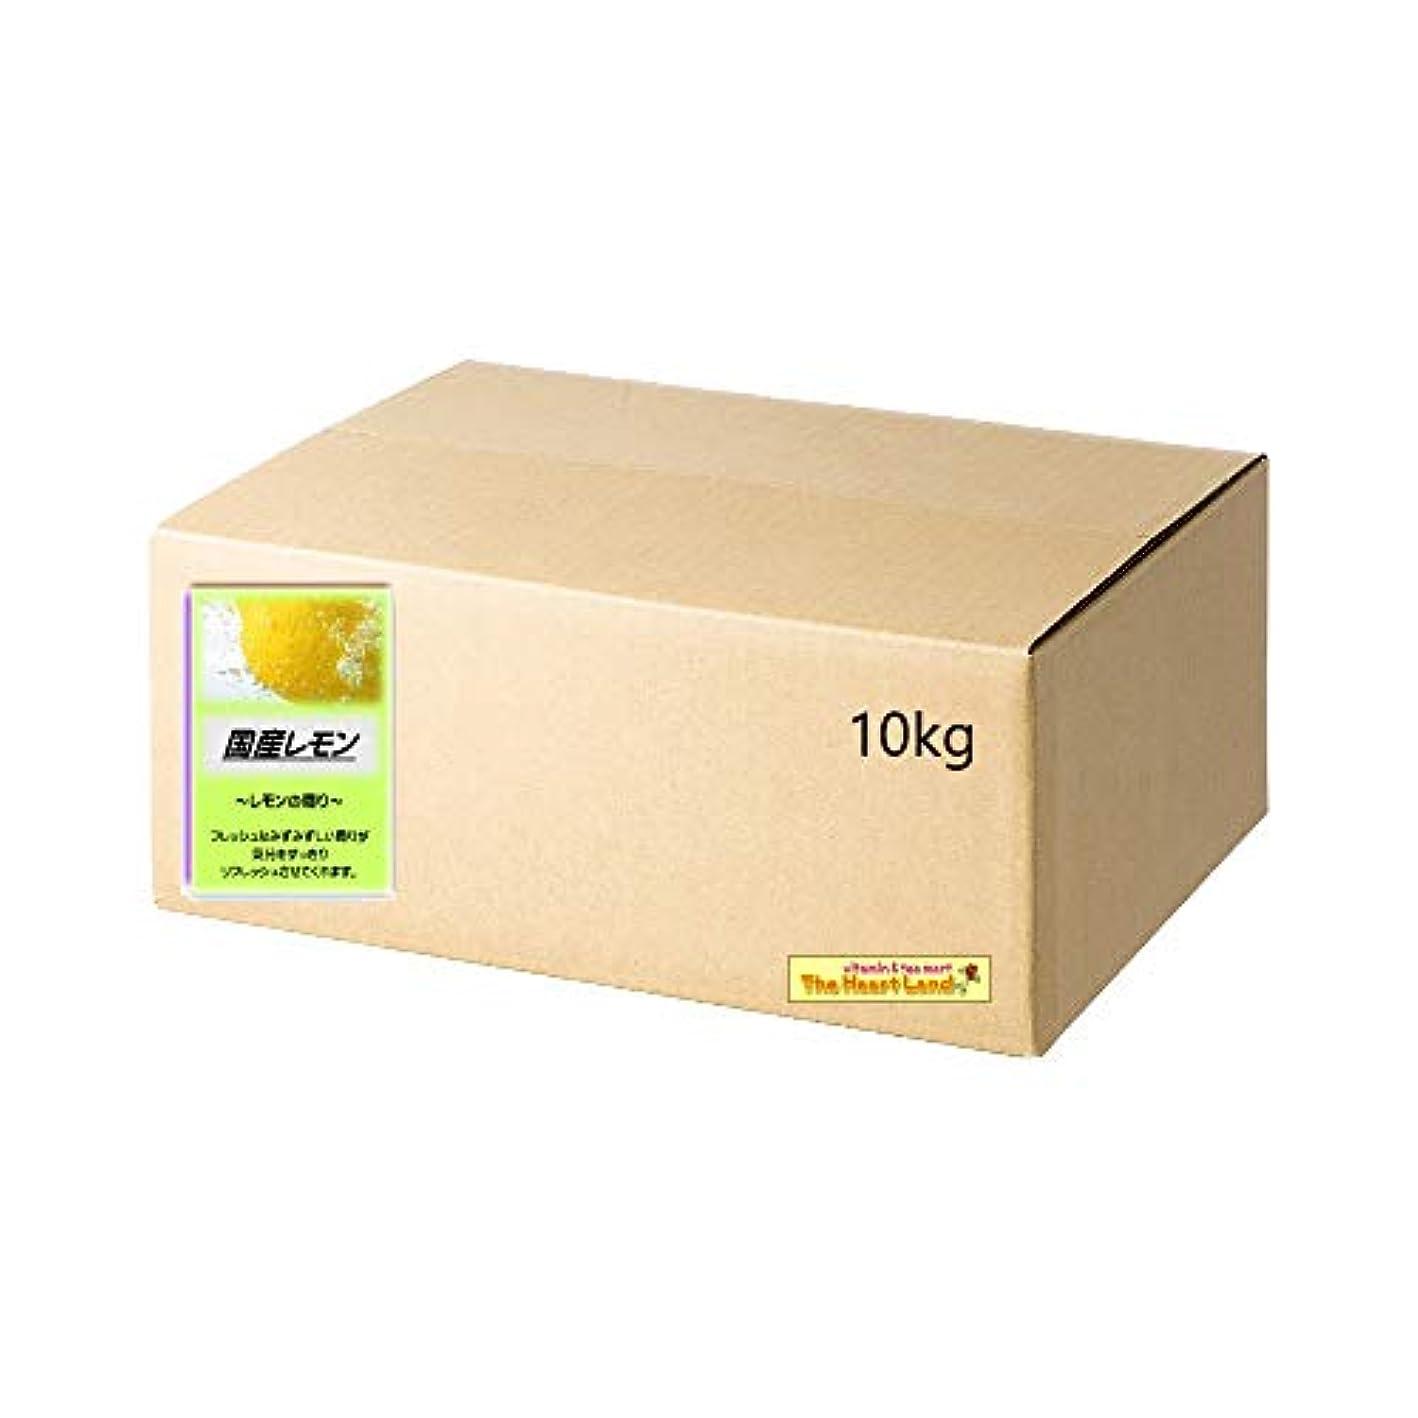 資料雇用者乗算アサヒ入浴剤 浴用入浴化粧品 国産レモン 10kg